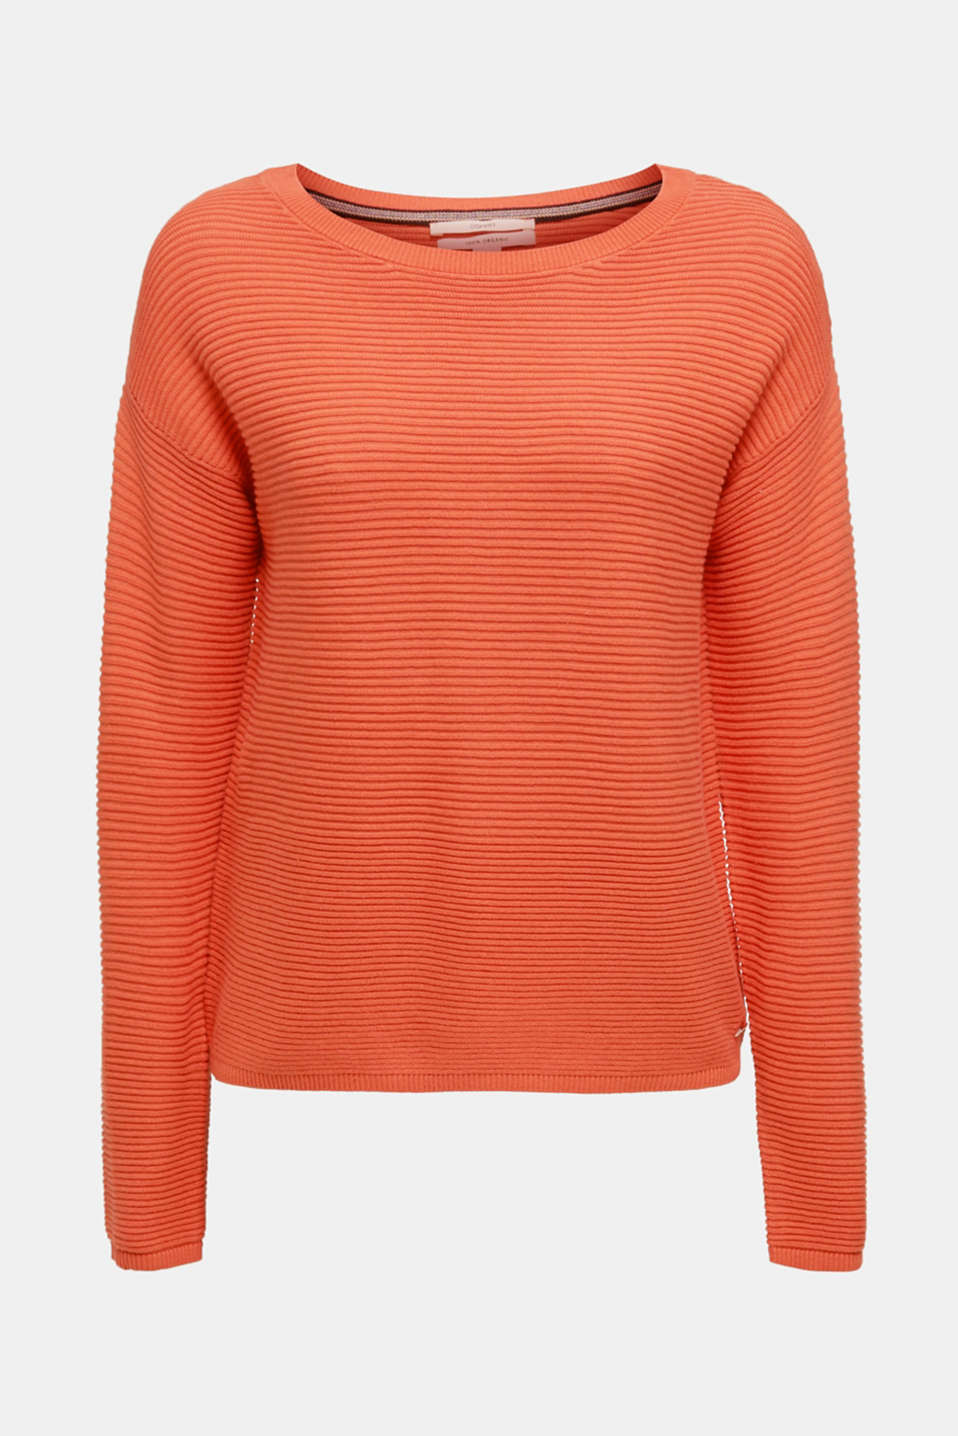 Sweaters, BURNT ORANGE 2, detail image number 7